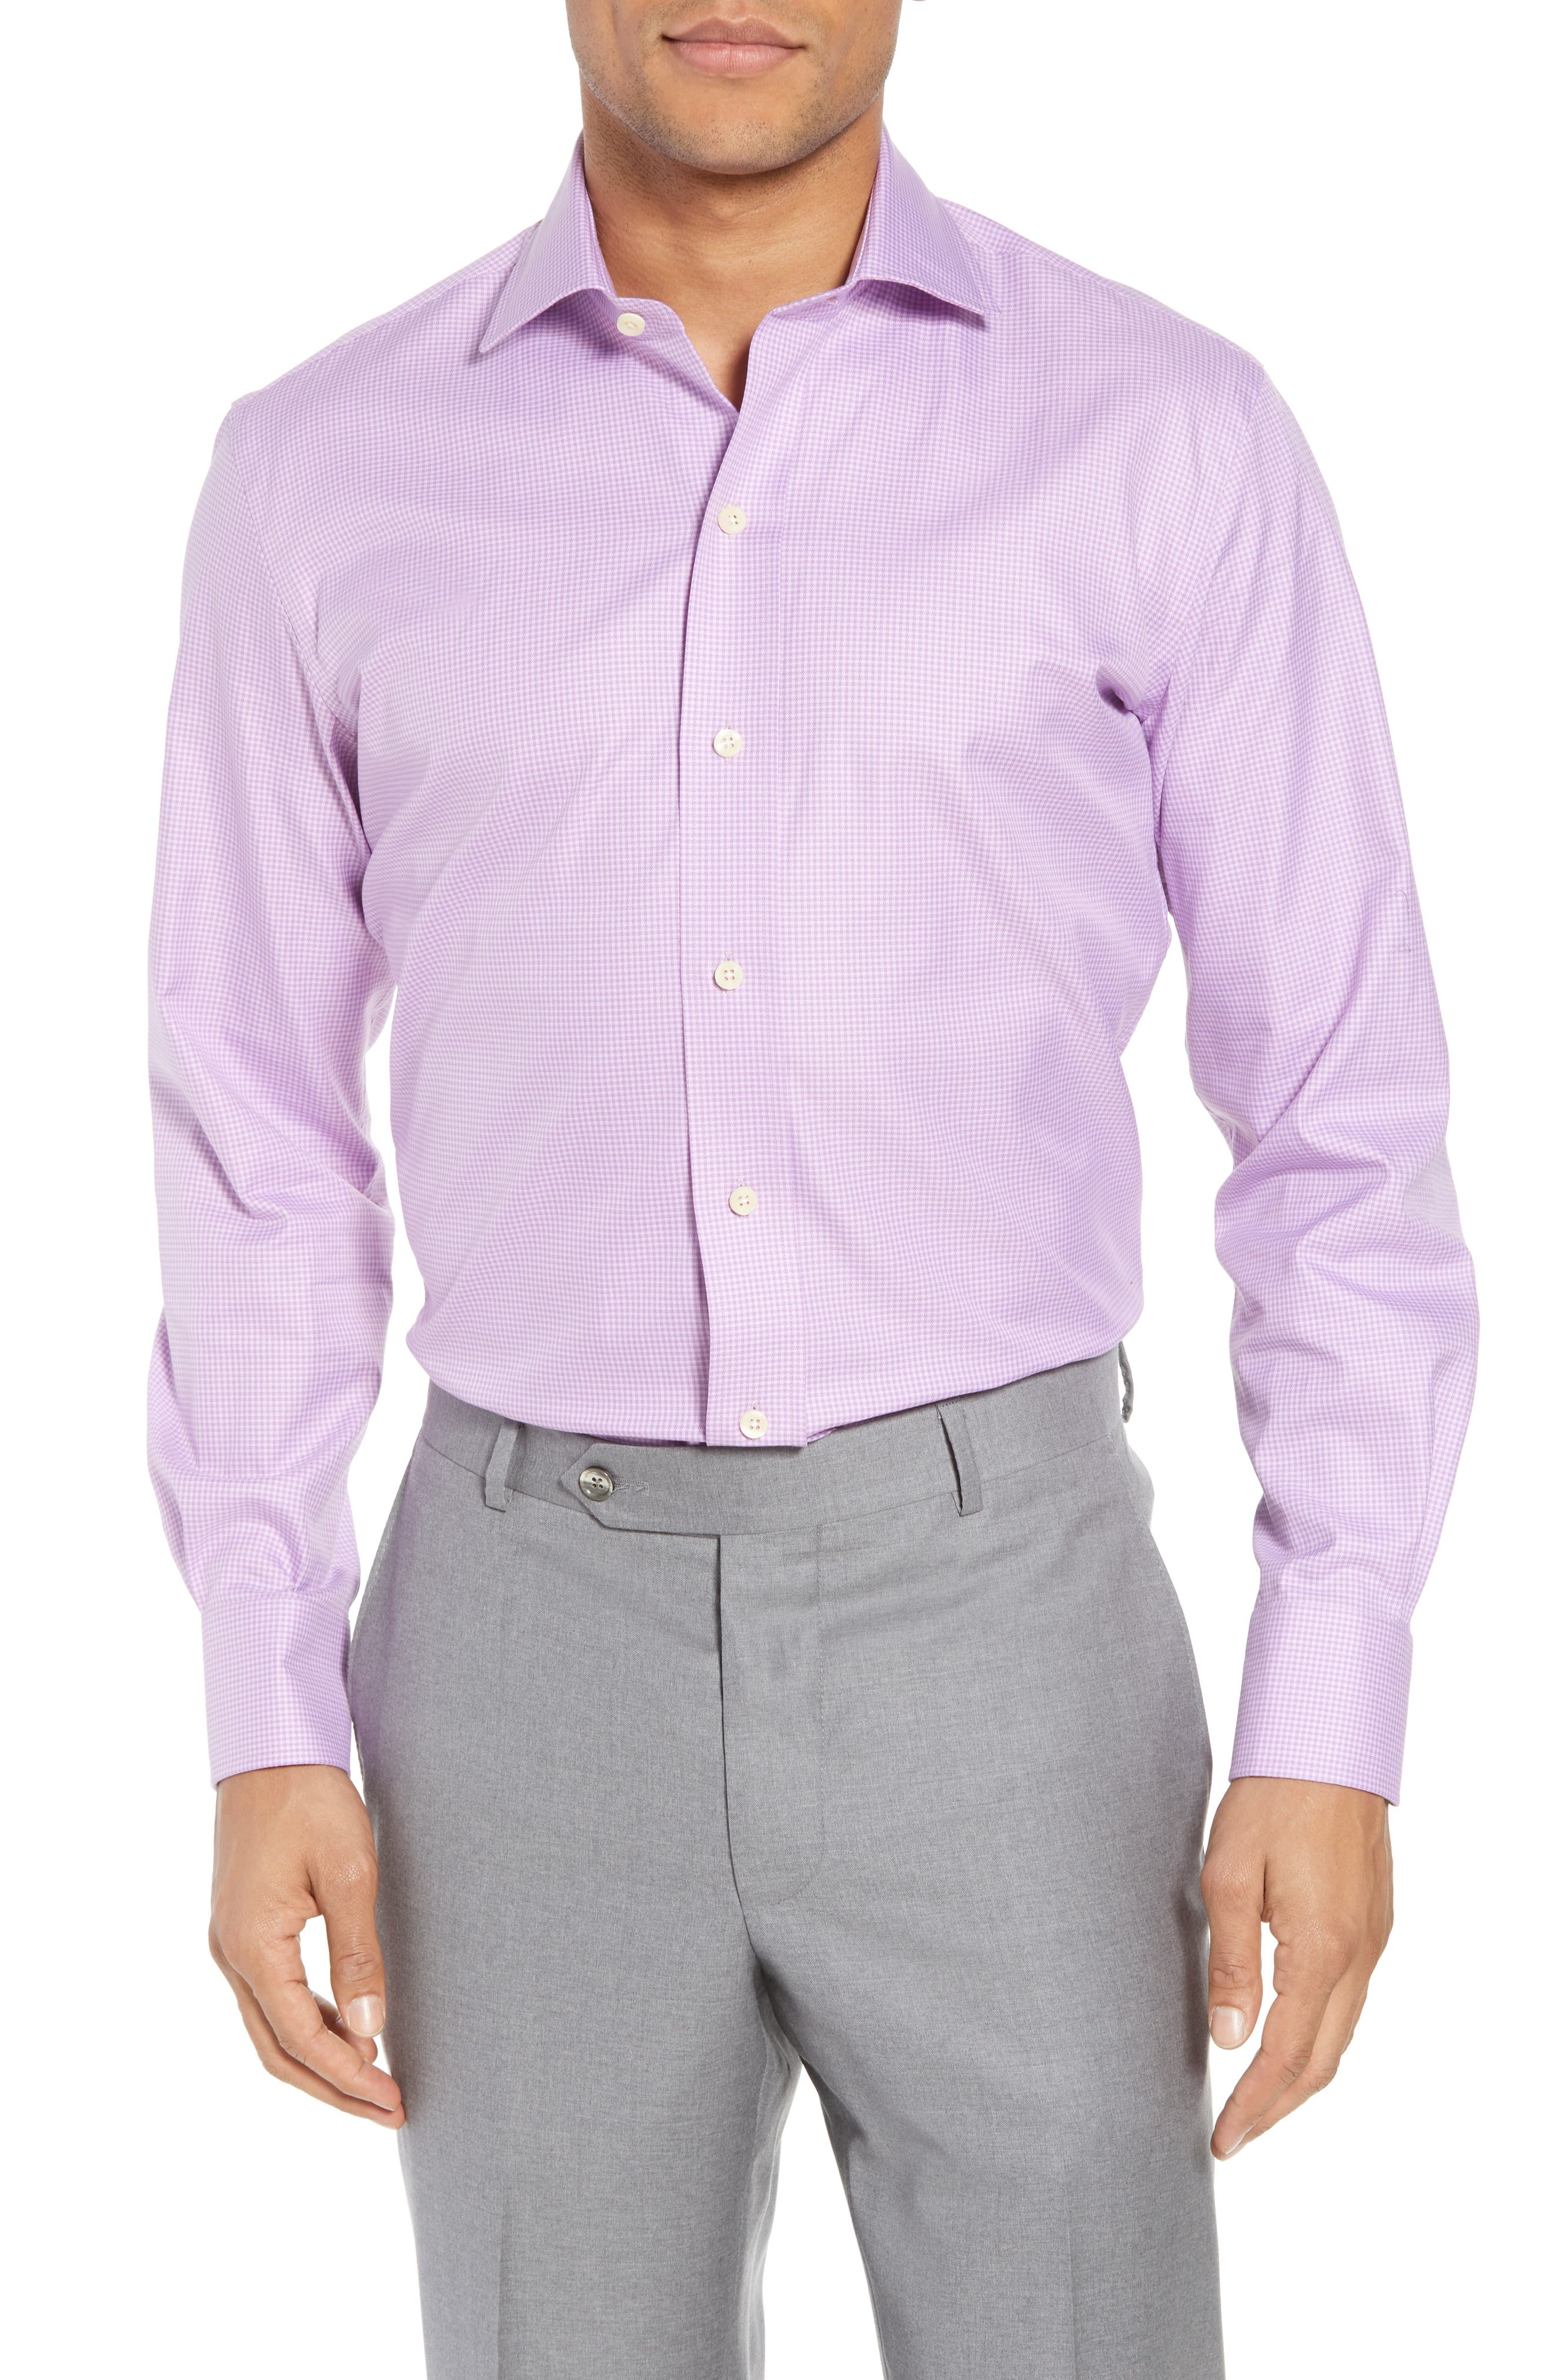 Innis Slim Fit Check Dress Shirt,                         Main,                         color, Lilac